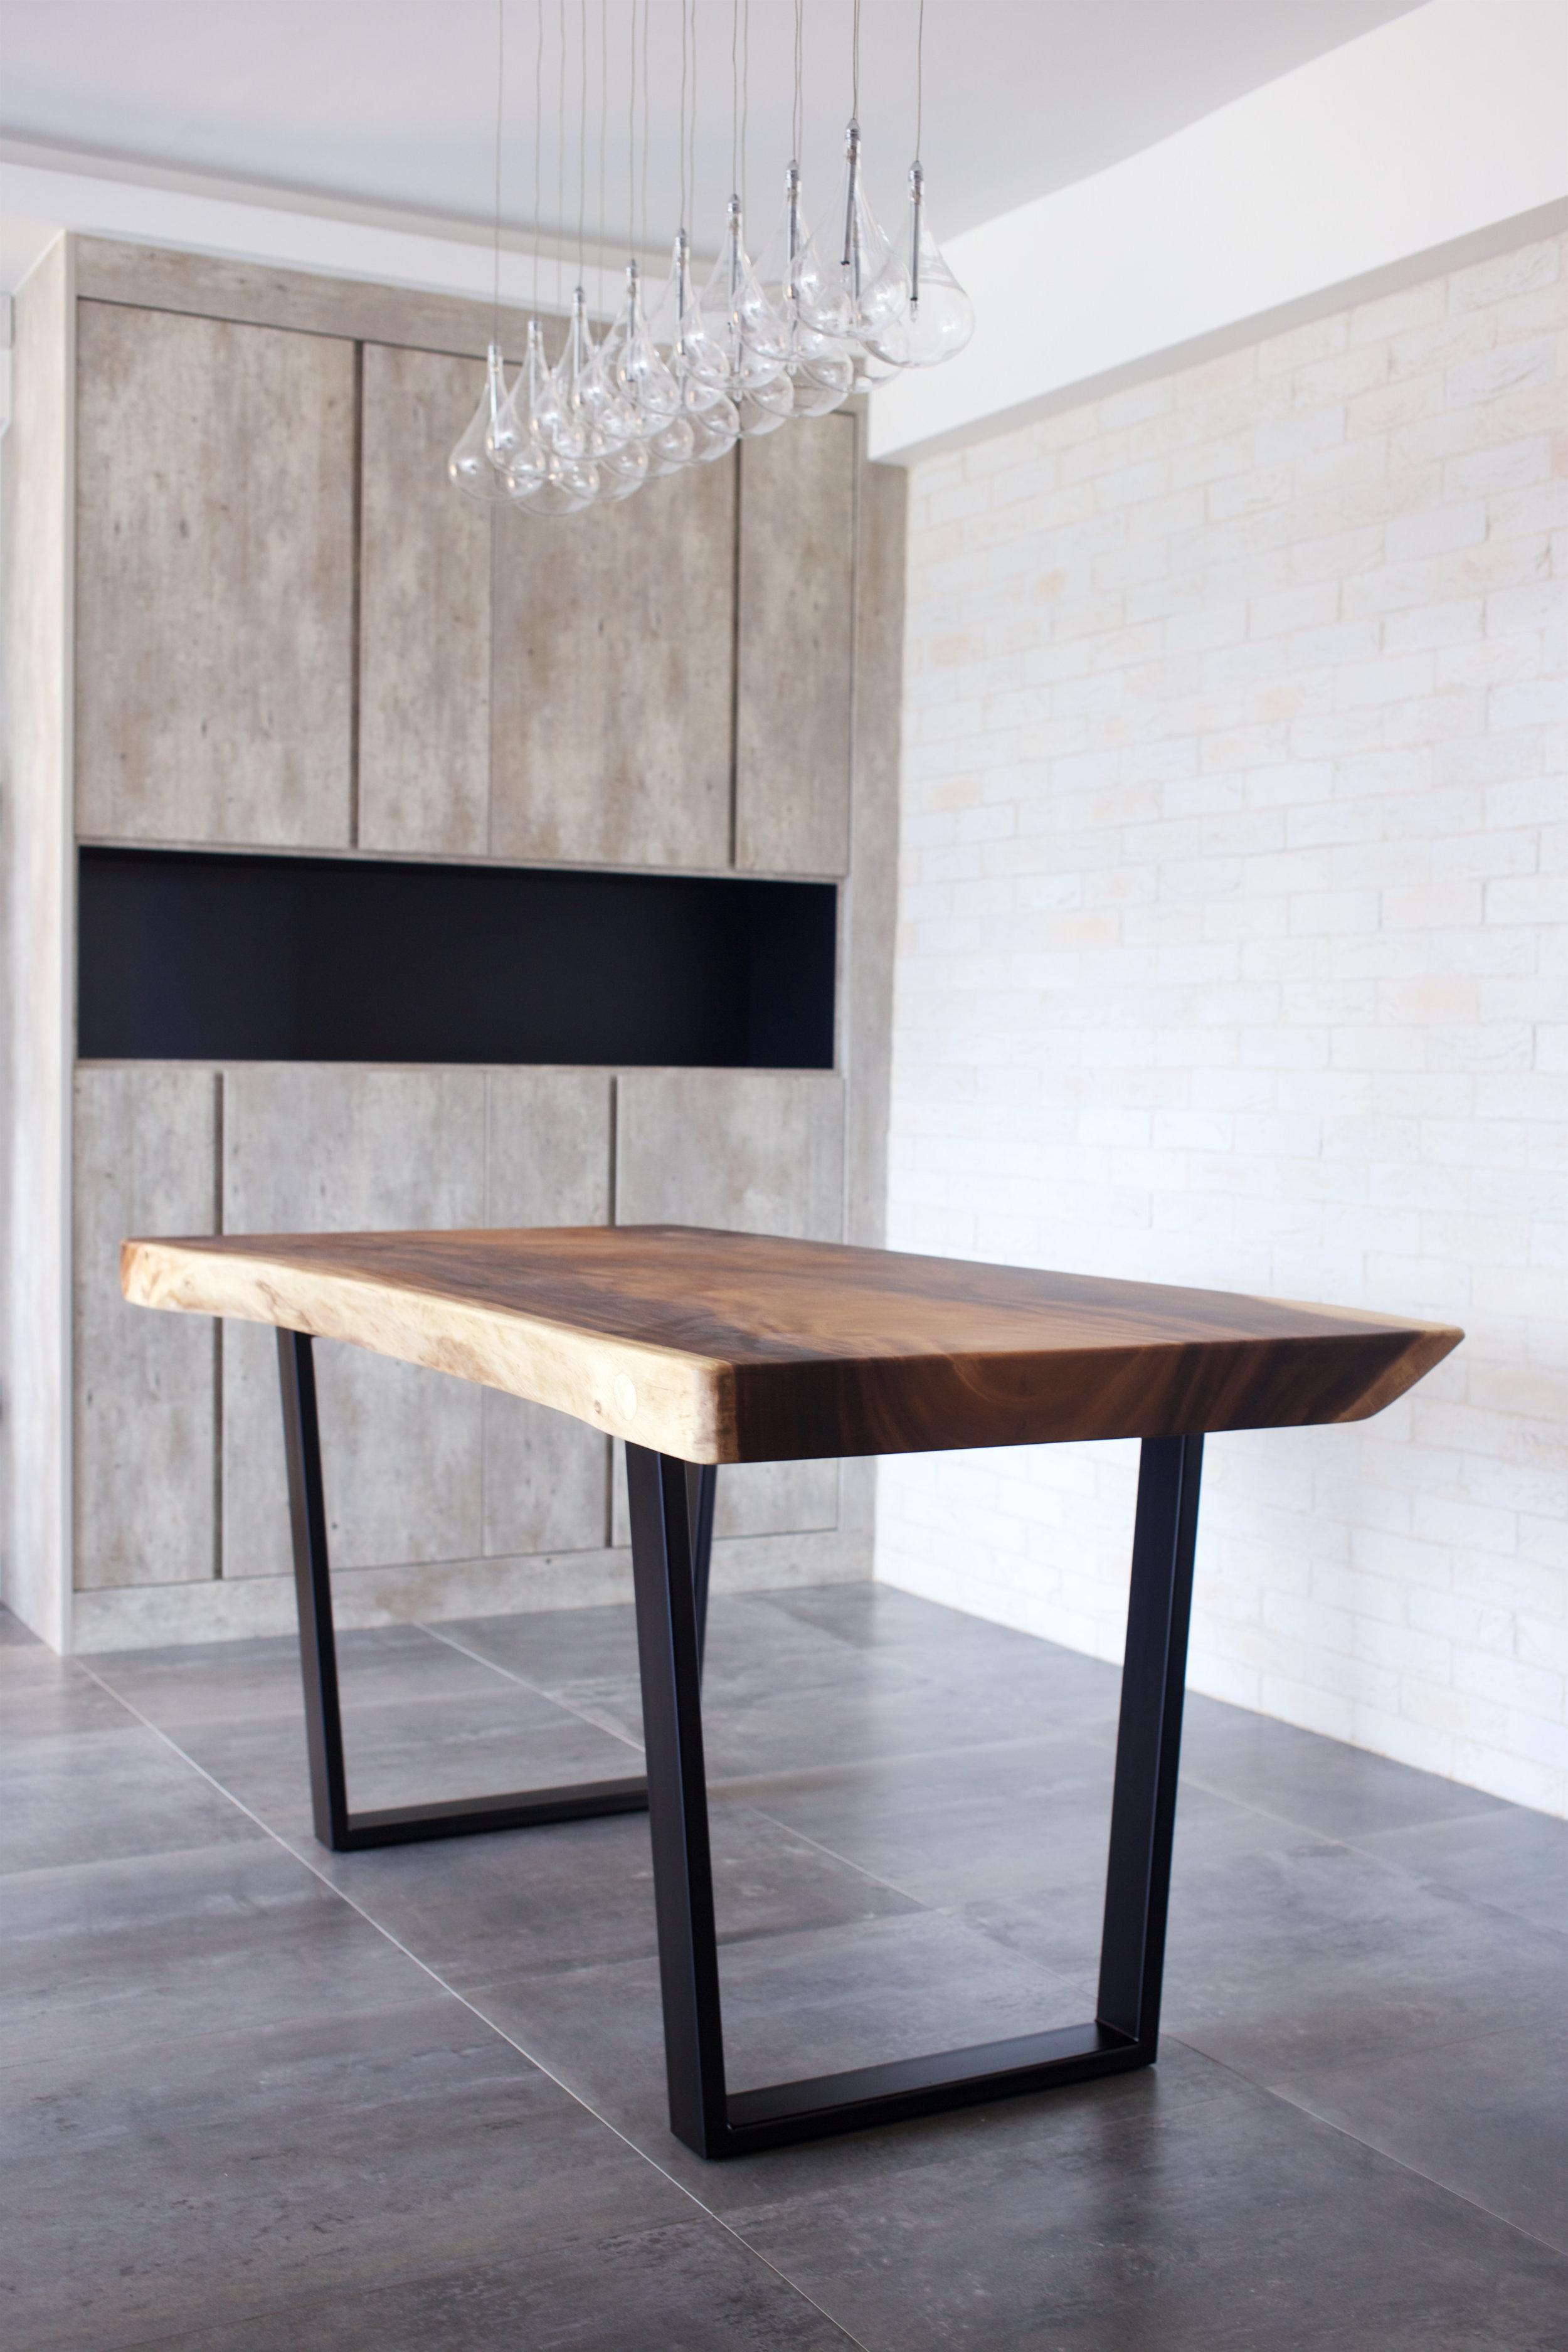 Suar Wood with Metal Legs Dining Table // Herman Furniture Singapore.jpg